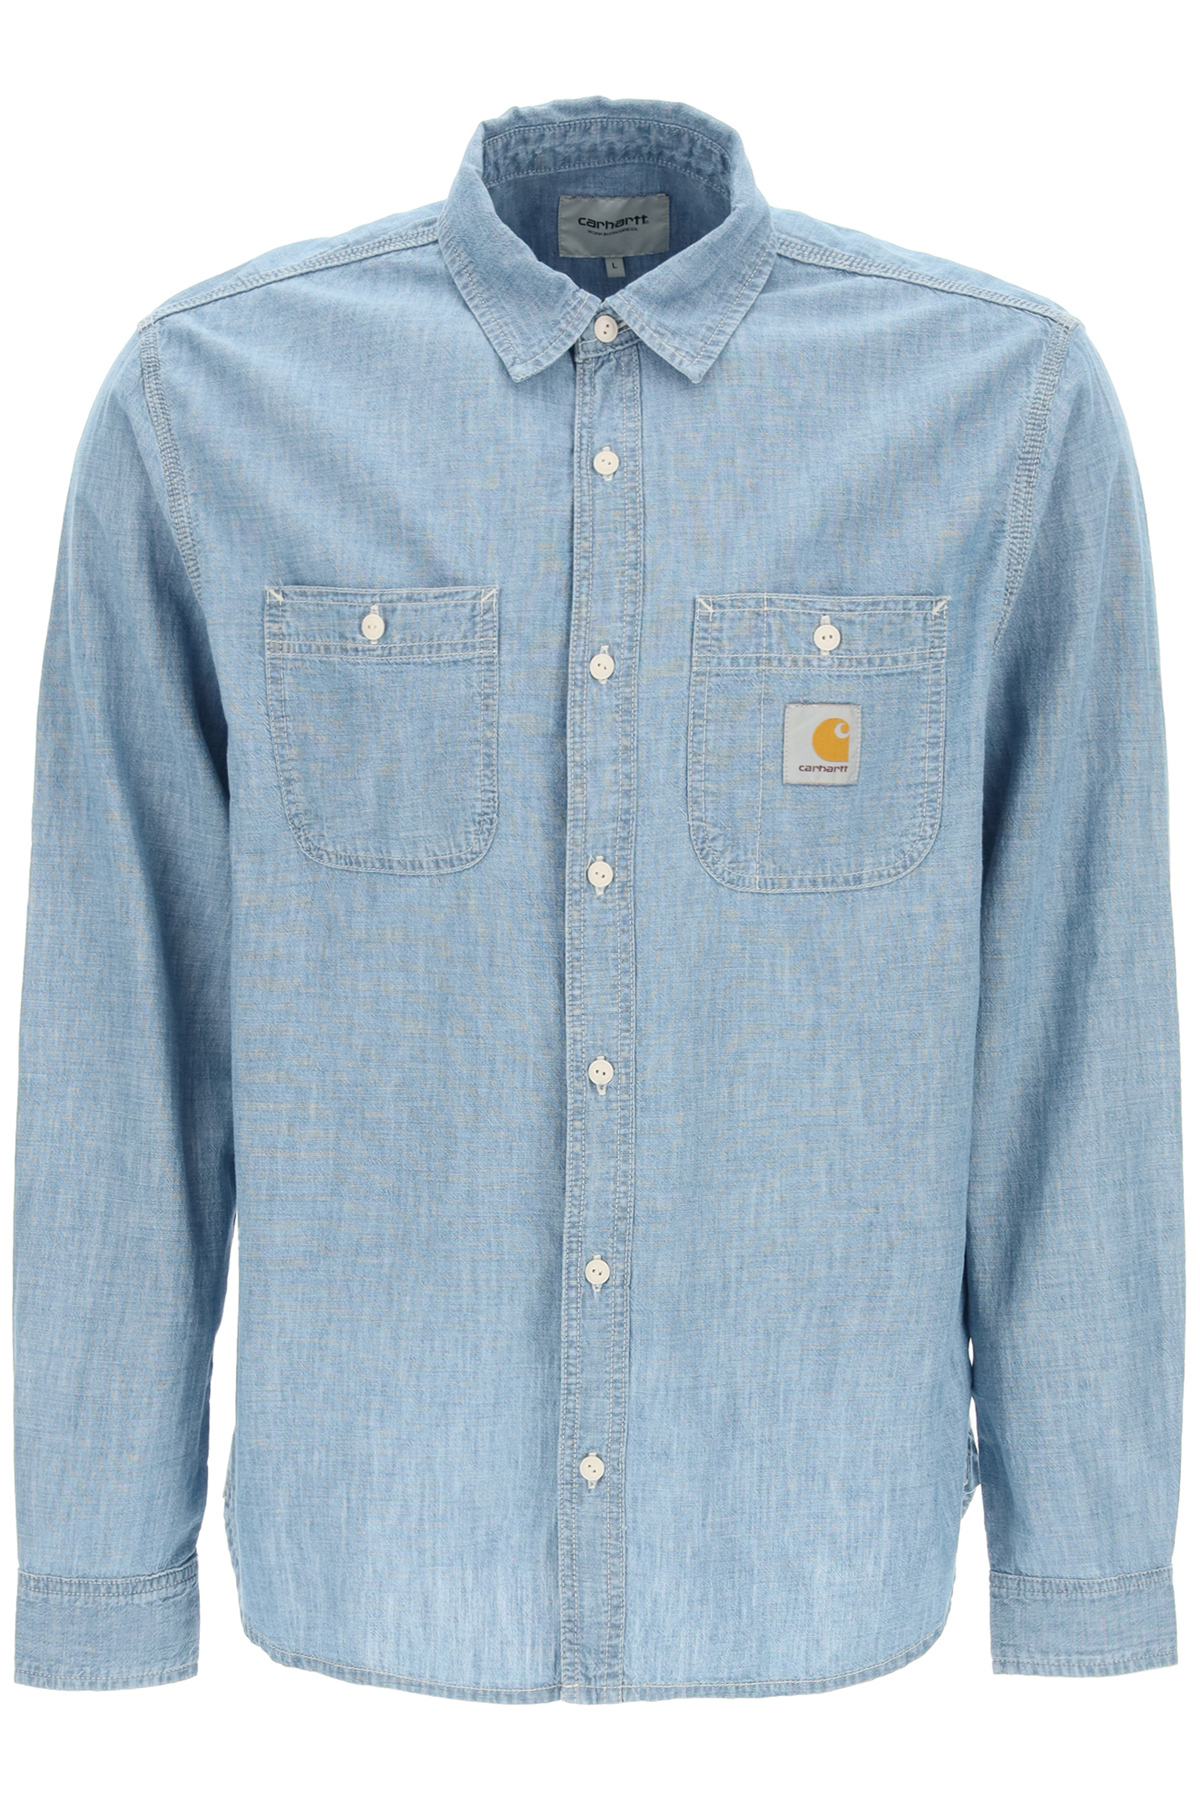 Carhartt camicia denim clink